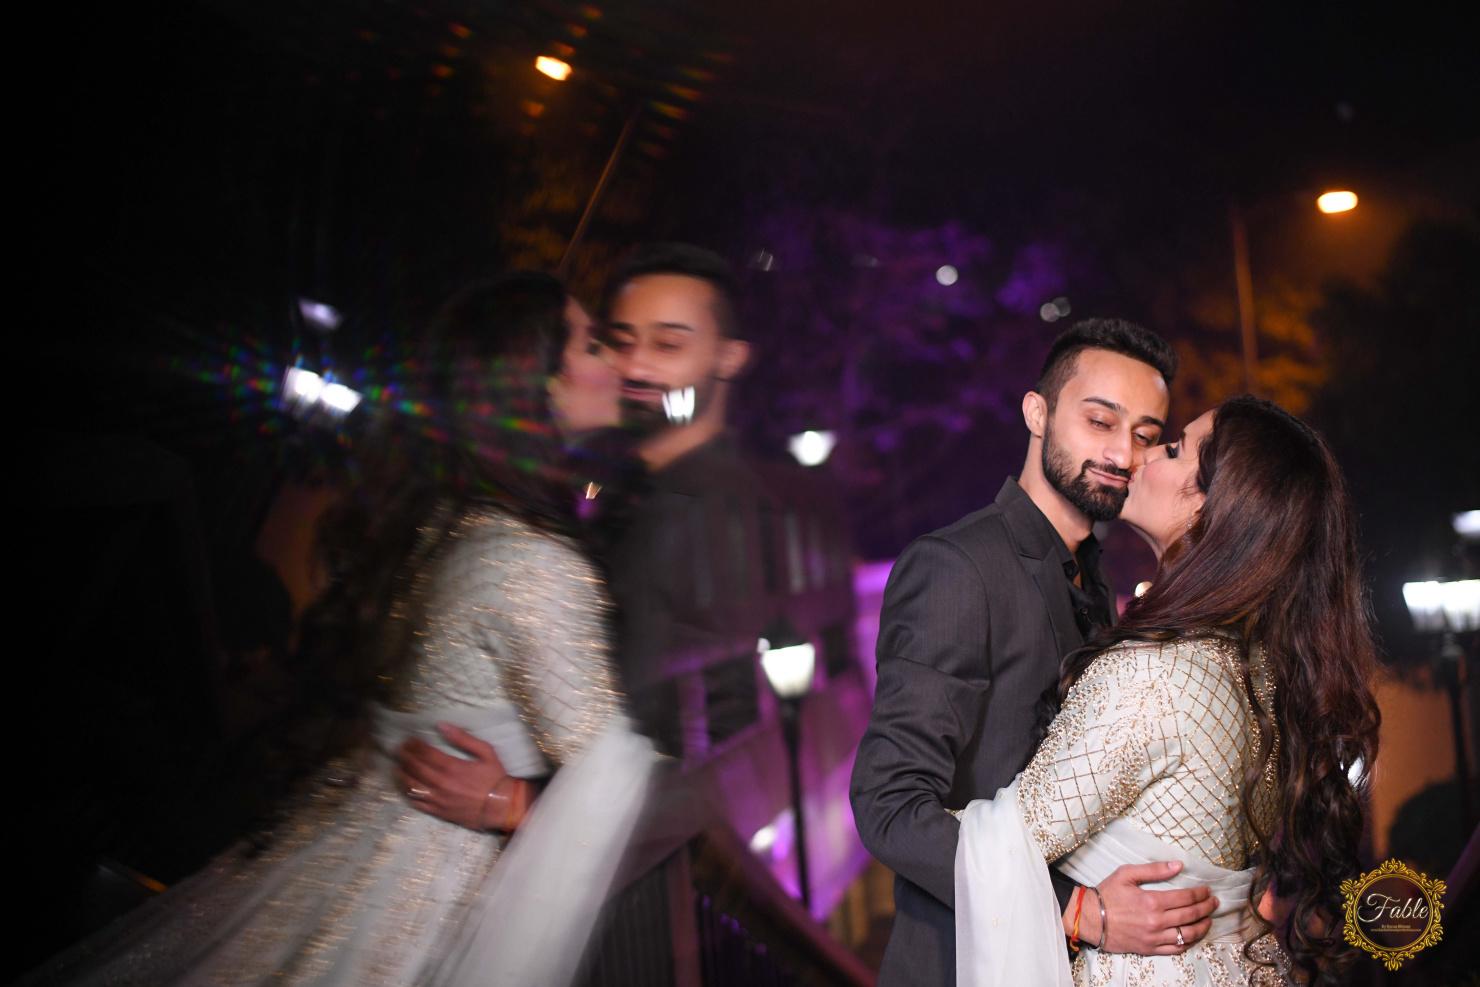 bride kissing on groom's cheeks